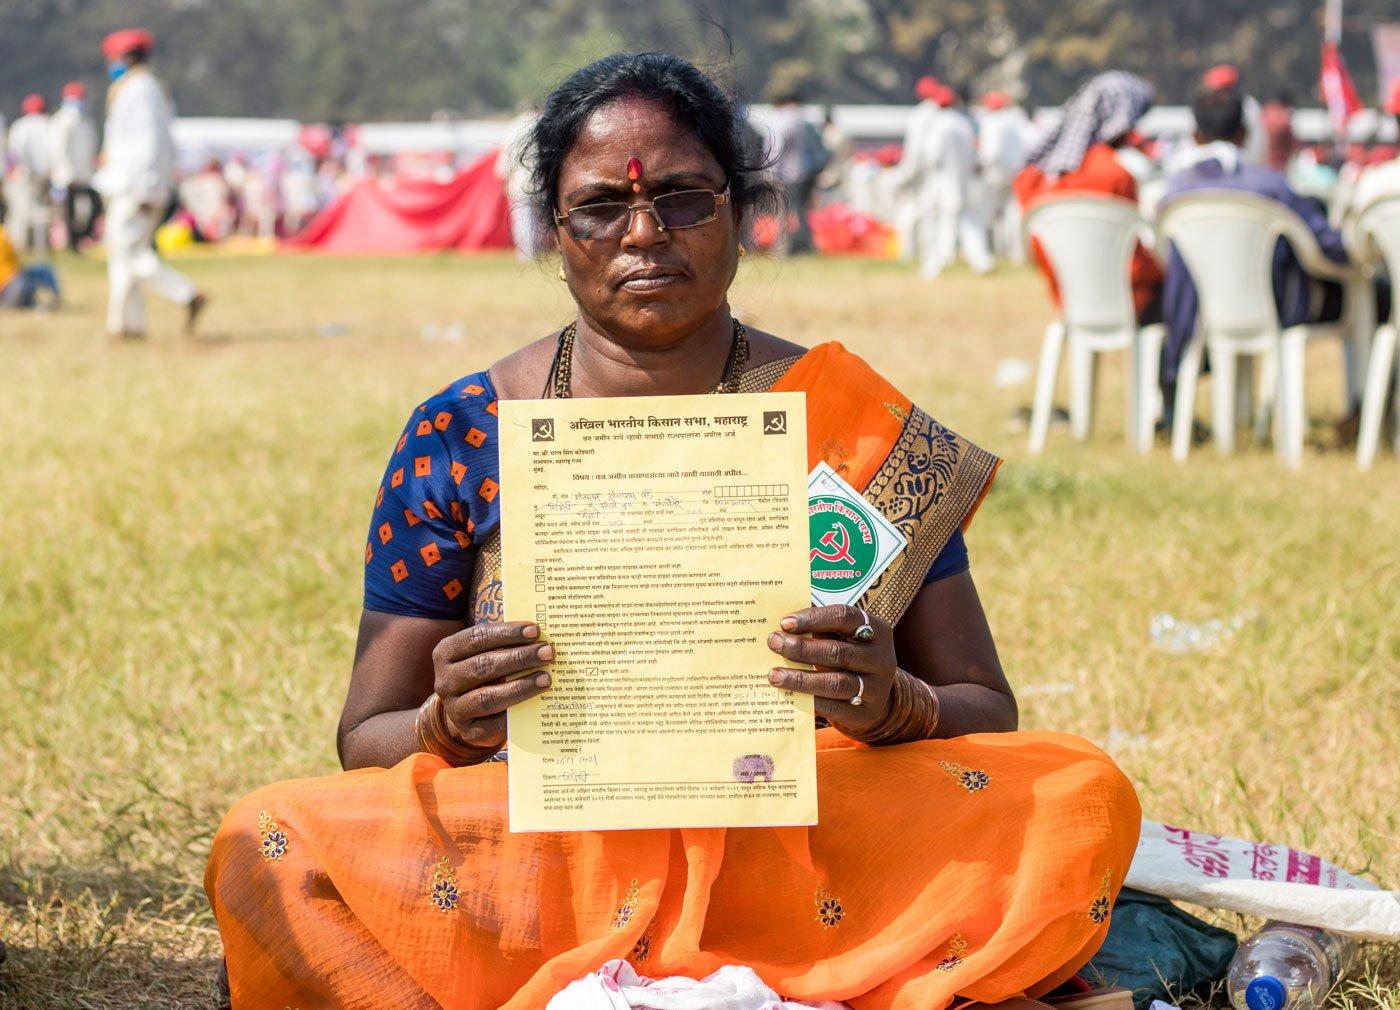 The farmer protest against the new farm bill